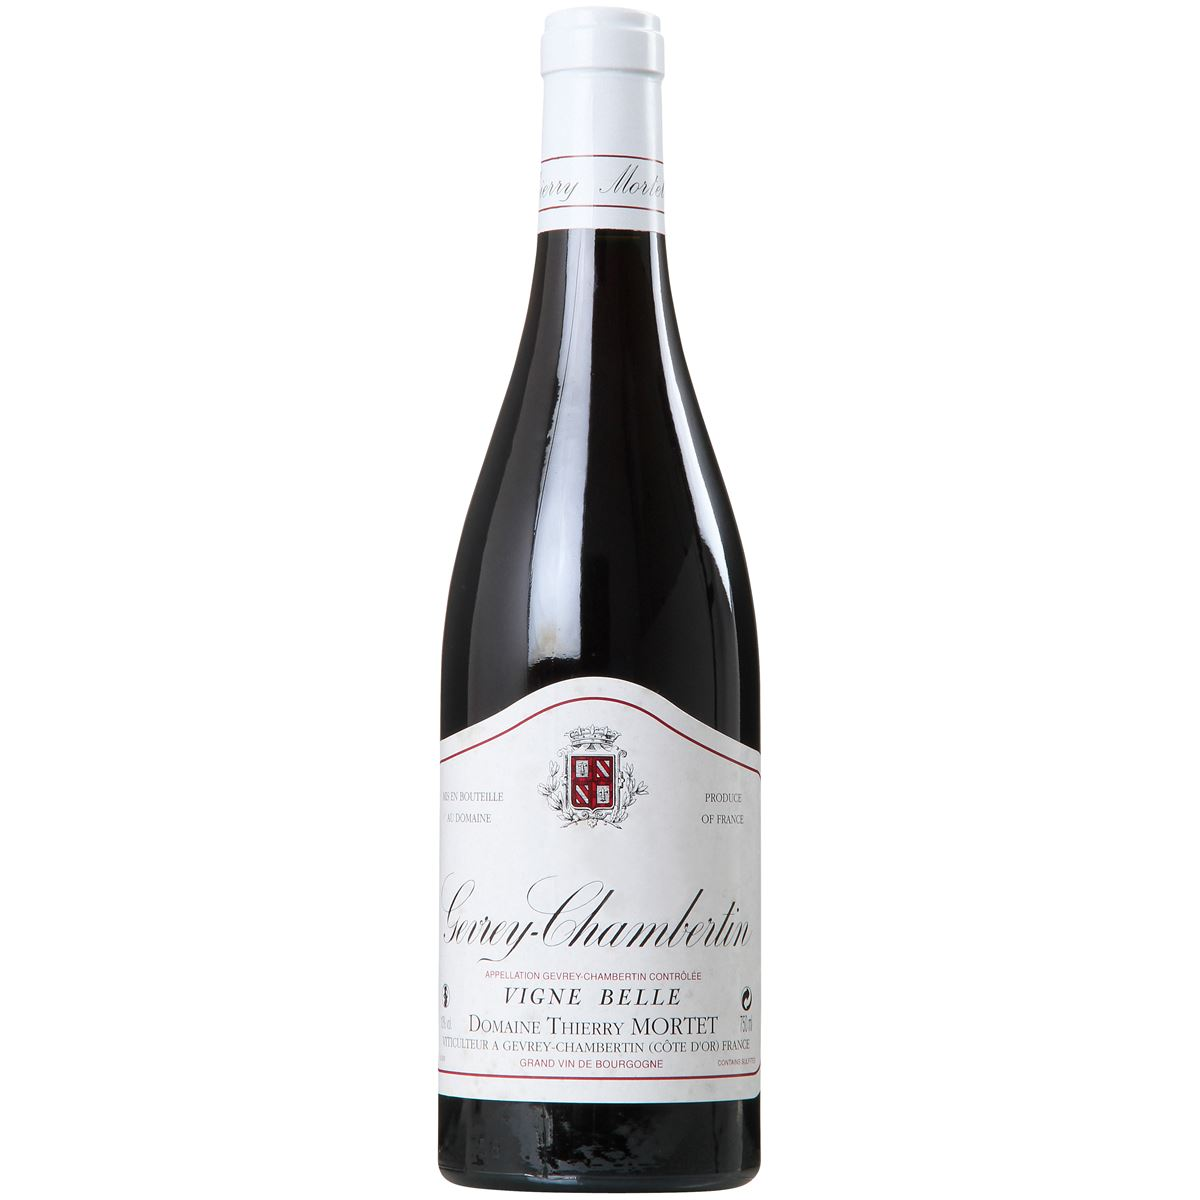 Vino rosso Gevrey-Chambertin Vigne Belle